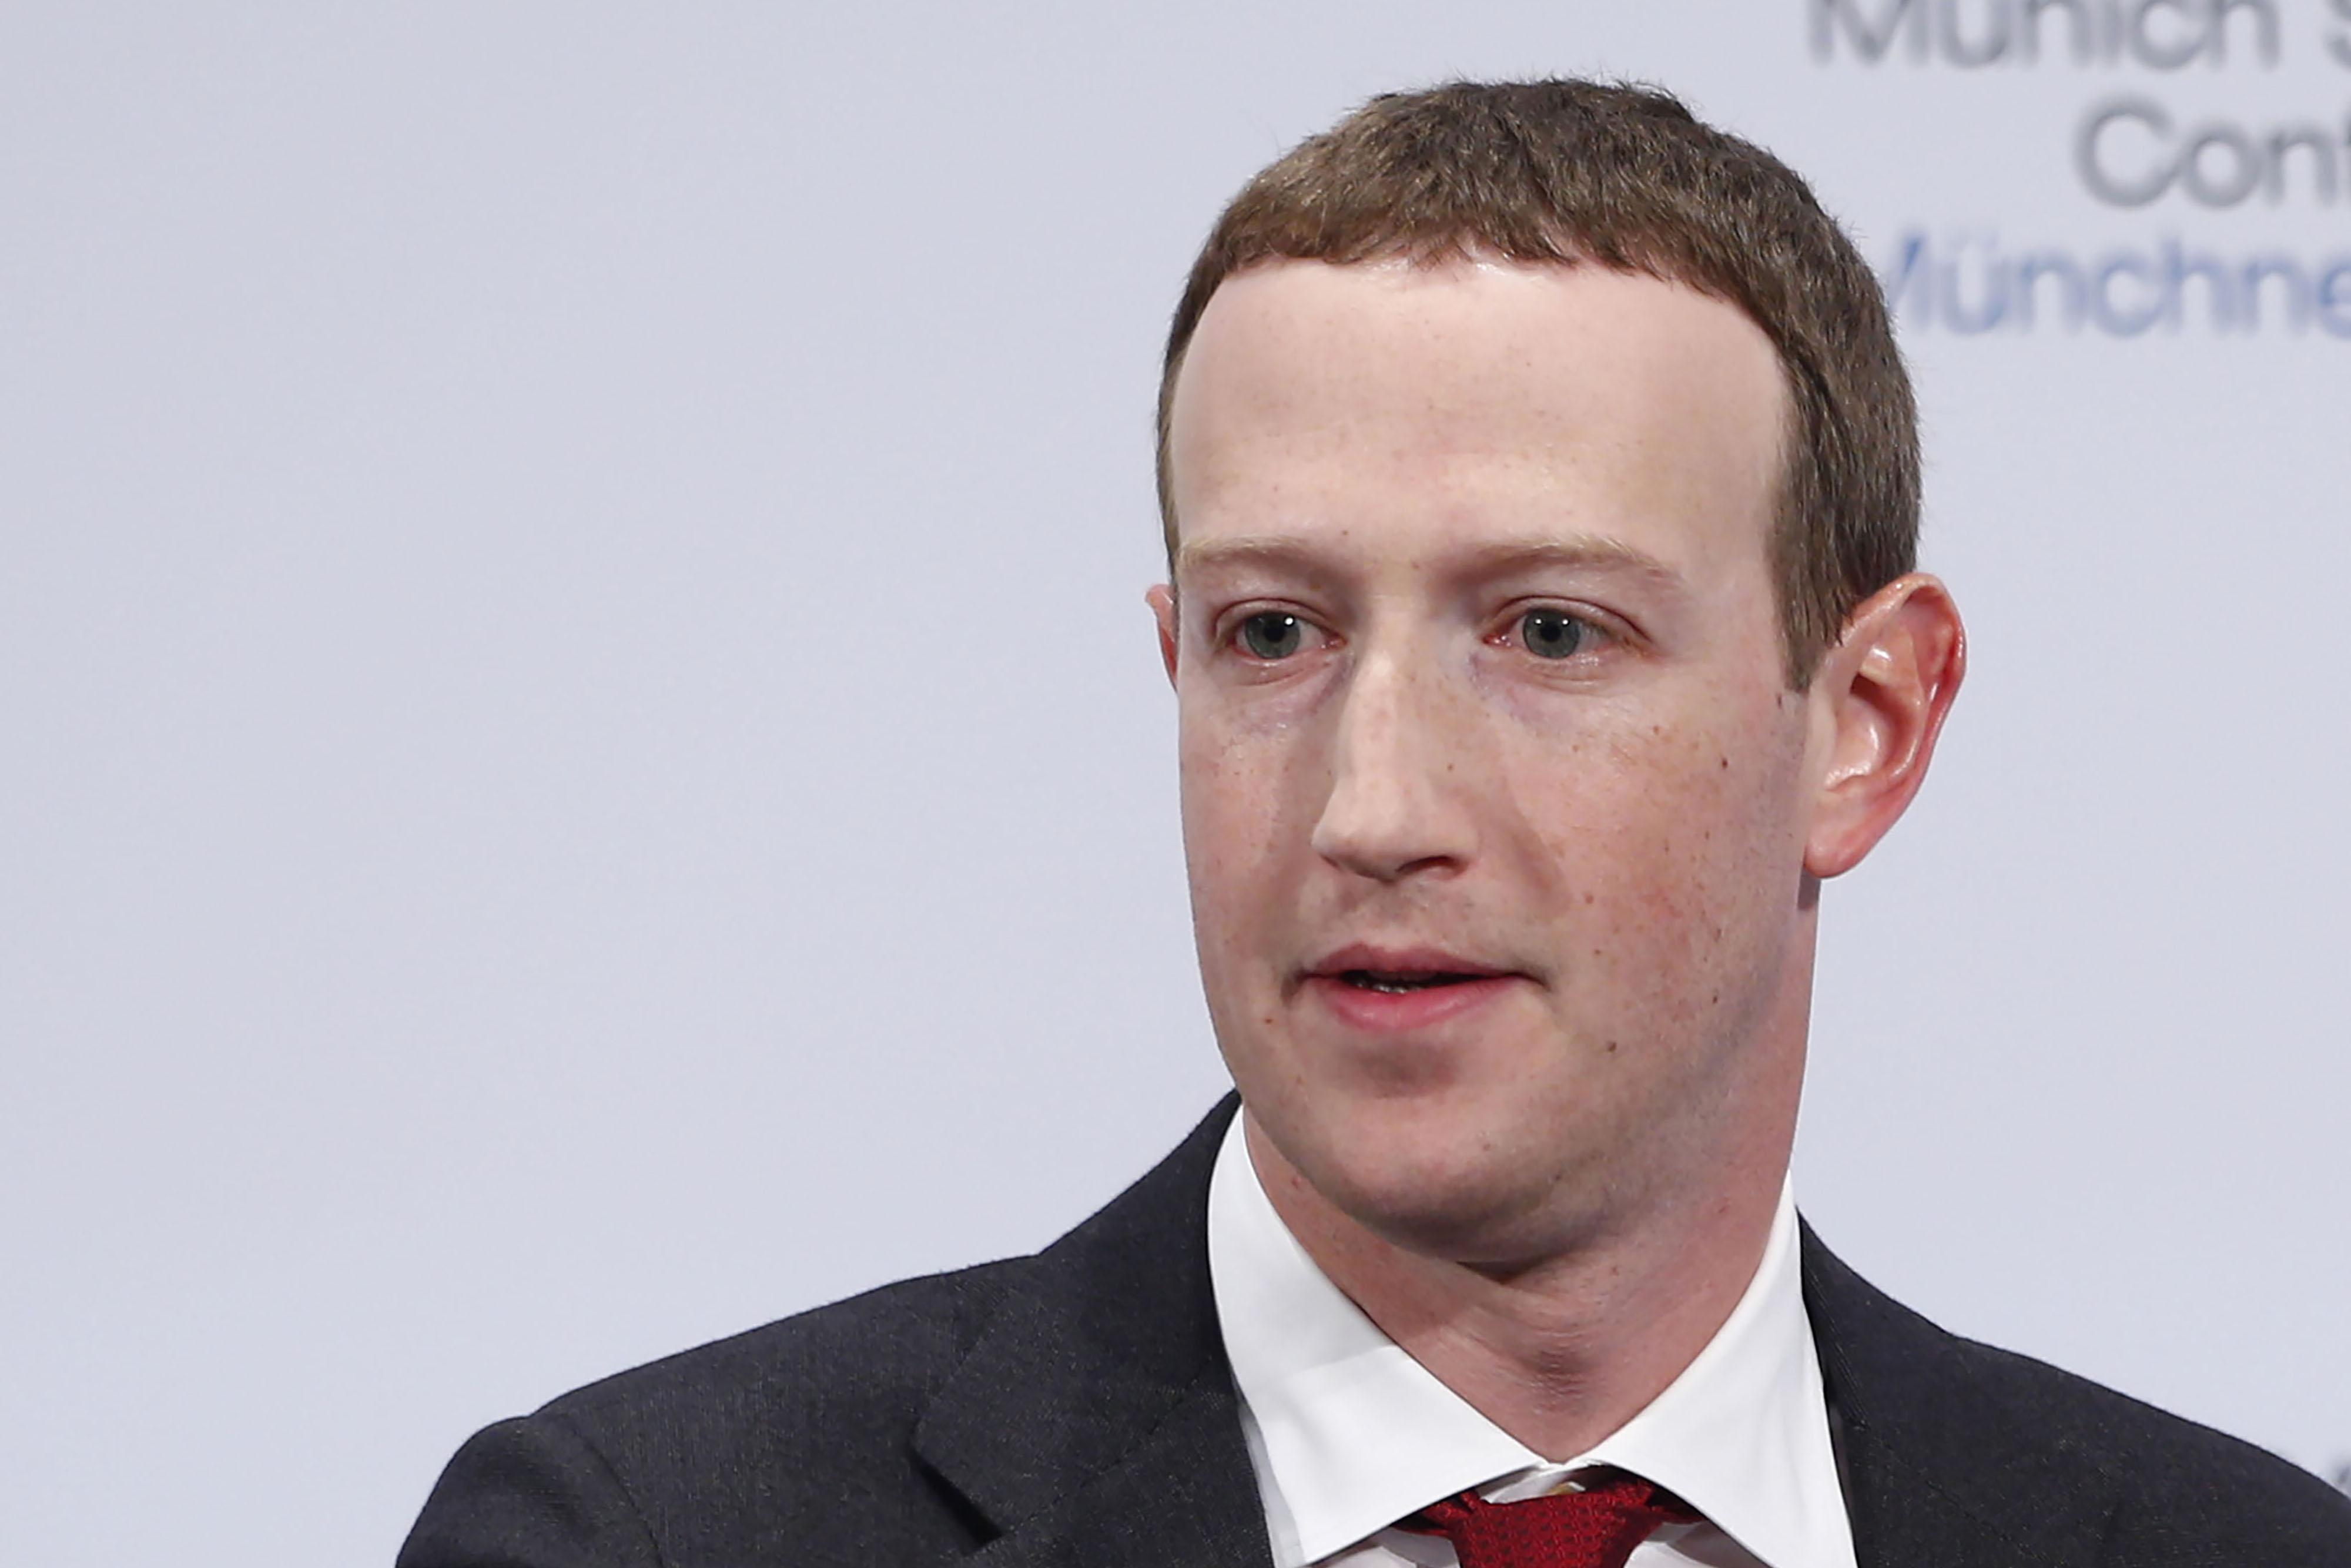 Facebook Will Halt Political Ads in the US After Polls Close on Nov. 3